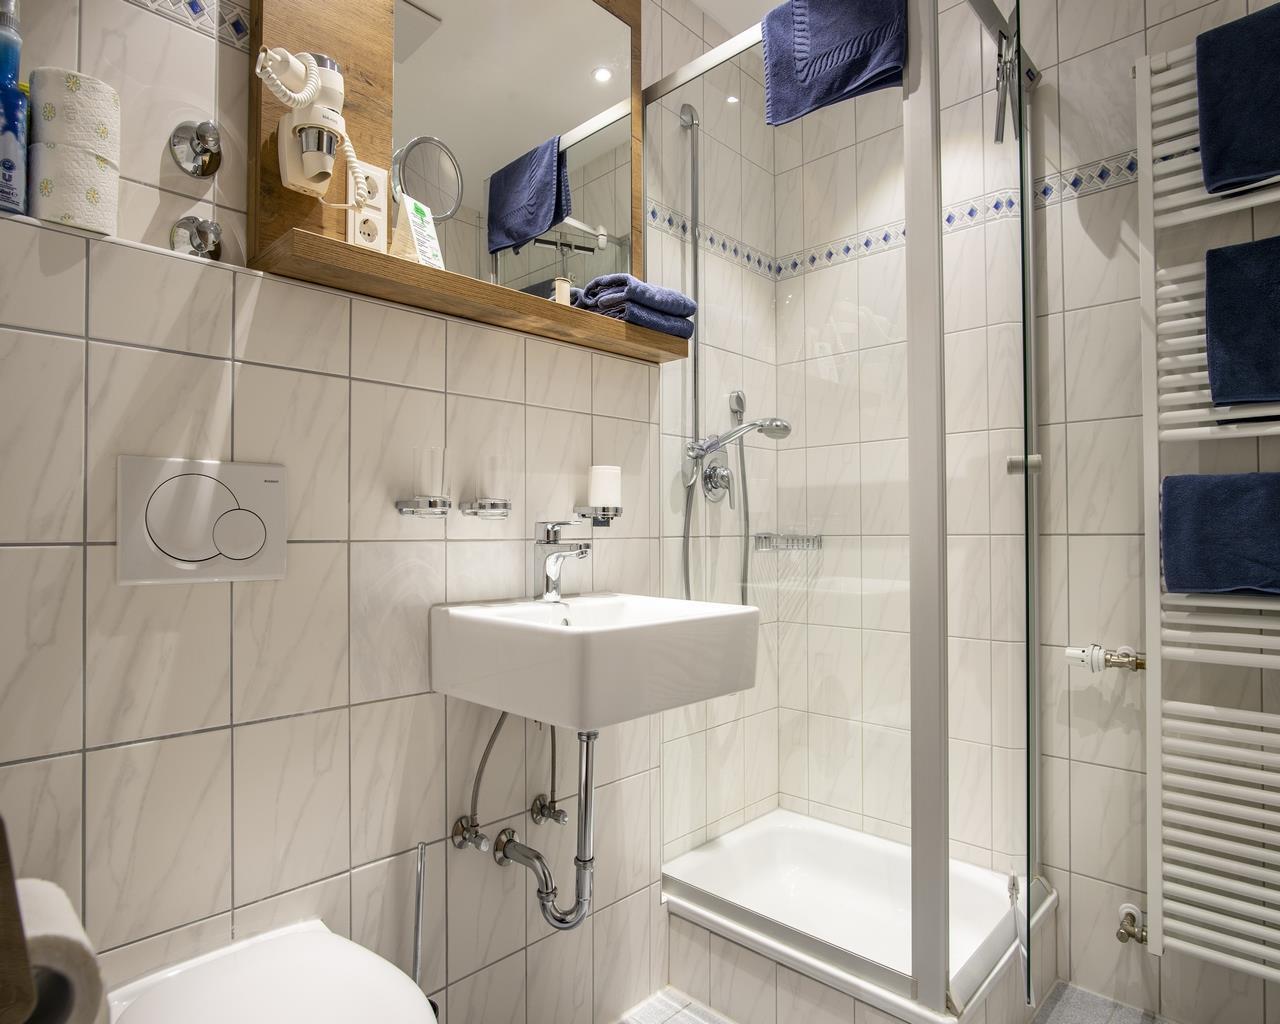 Appartement de vacances Gästehaus Boersch - Familie Jochum Apartment/Südbalkon/Dusche, WC, Nr. 1 (1483185), Riezlern (AT), Kleinwalsertal, Vorarlberg, Autriche, image 29